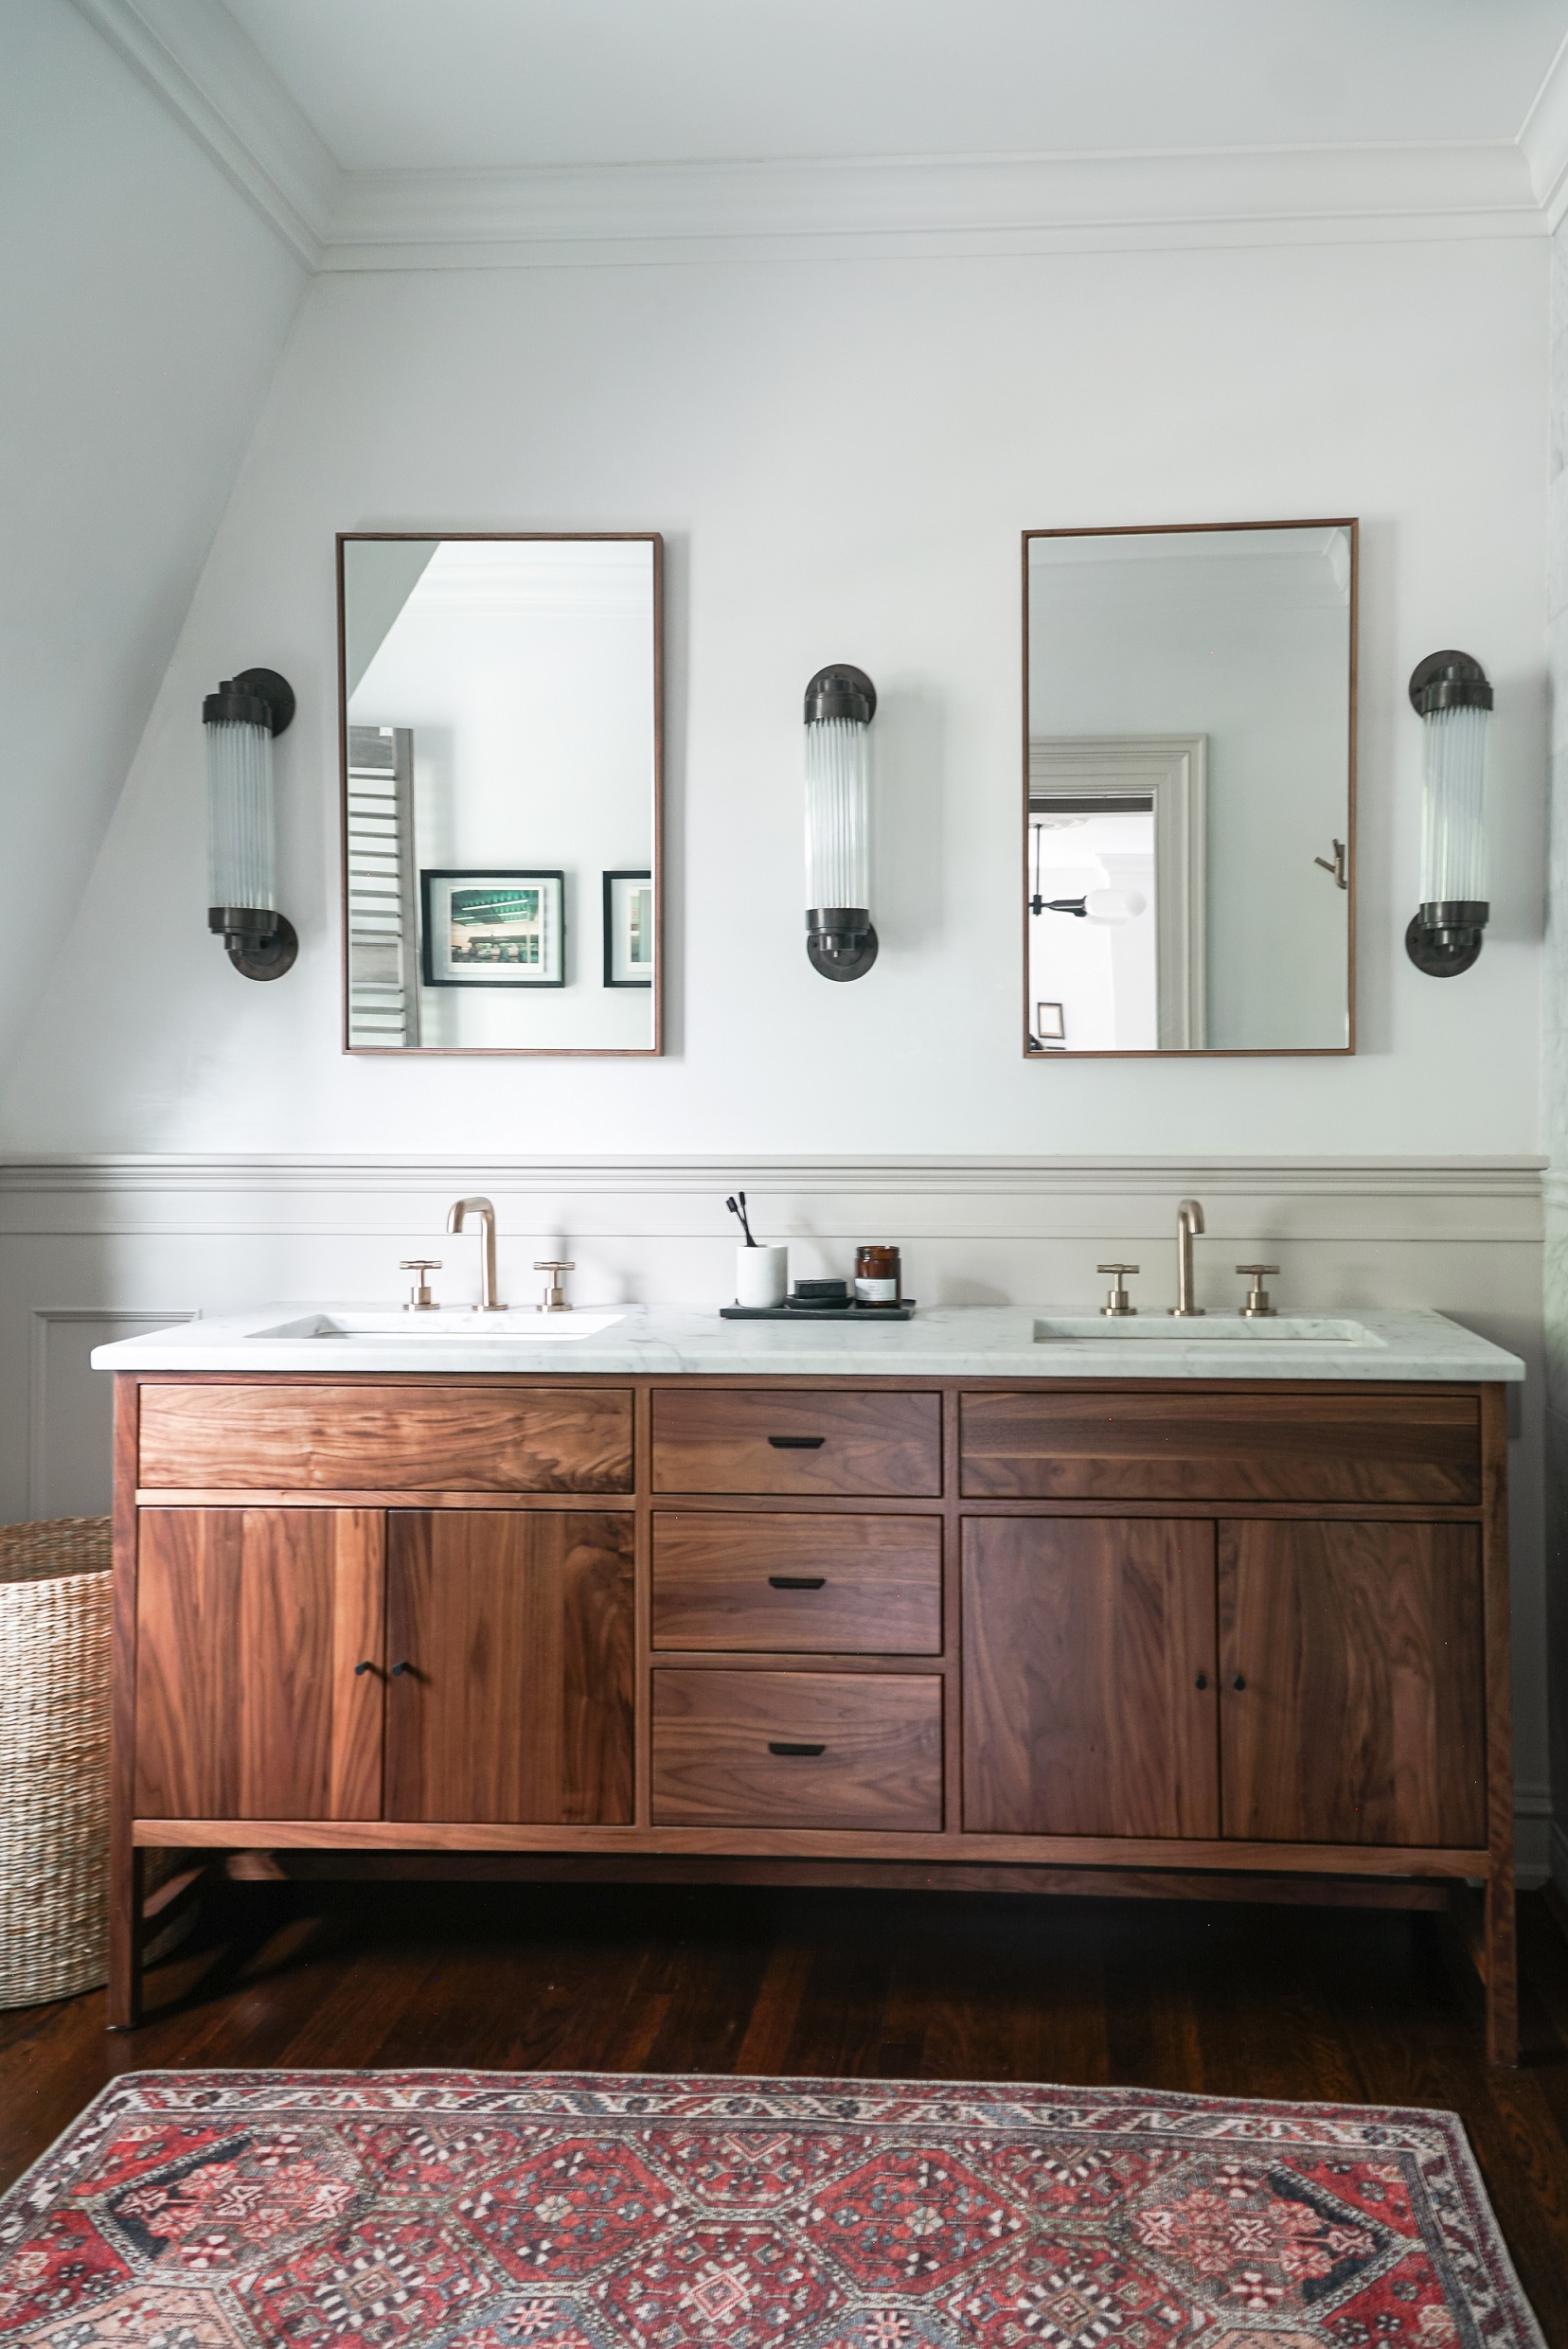 15 bathroom lighting ideas to brighten